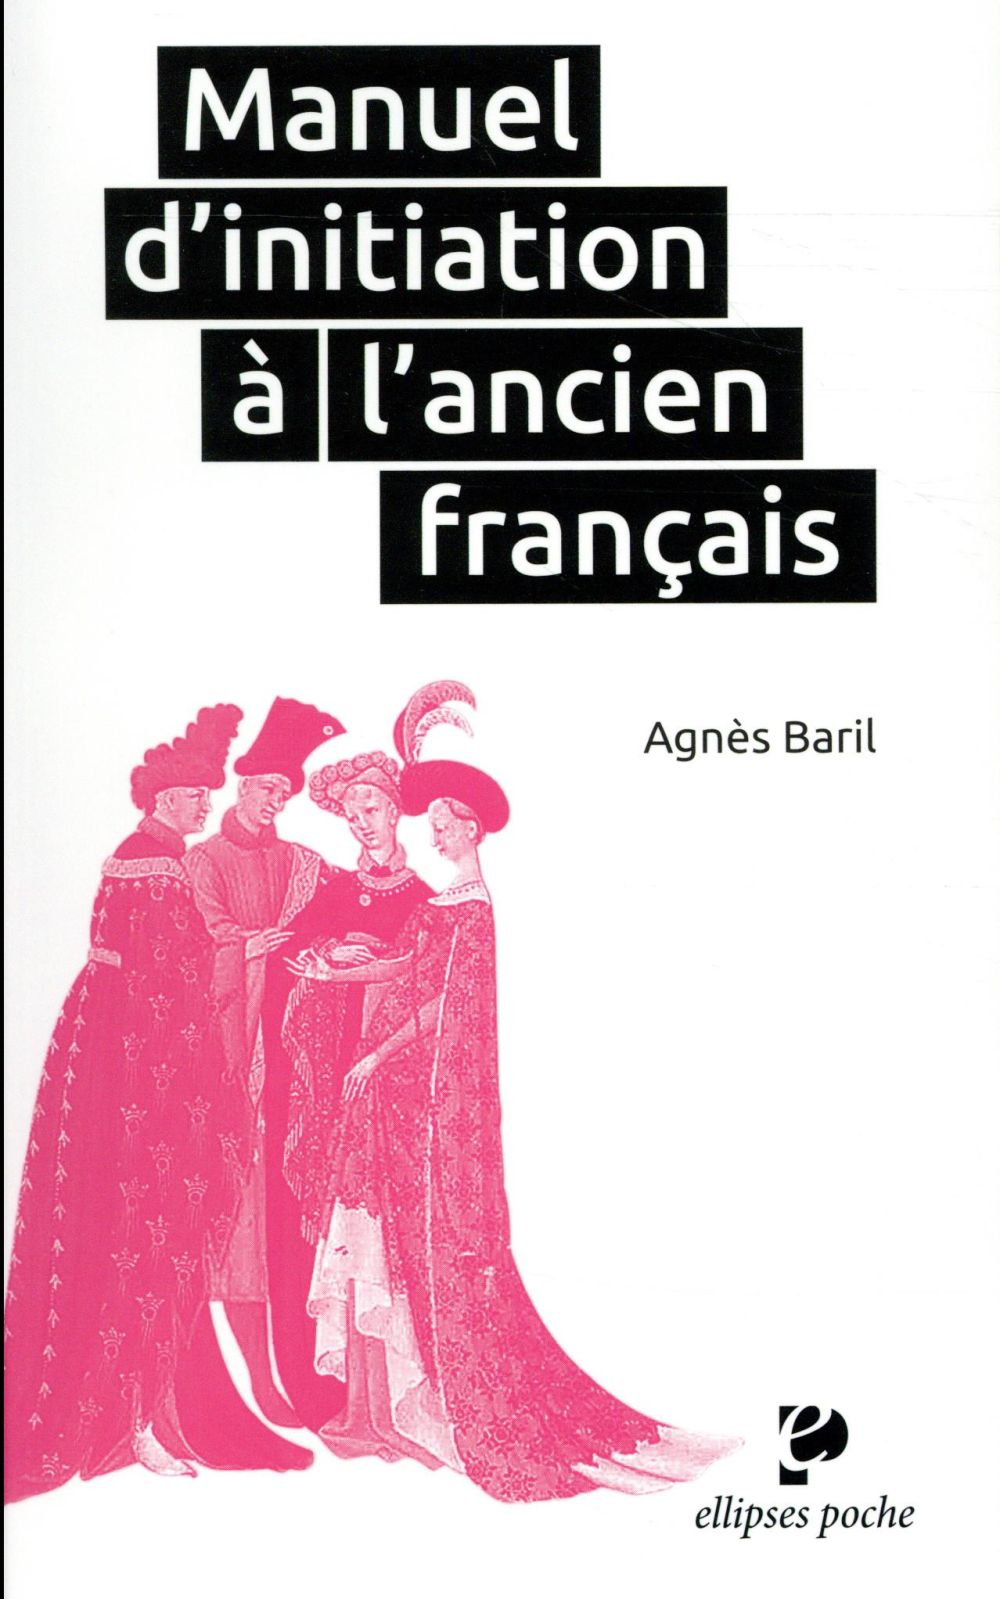 MANUEL D'INITIATION A L'ANCIEN FRANCAIS